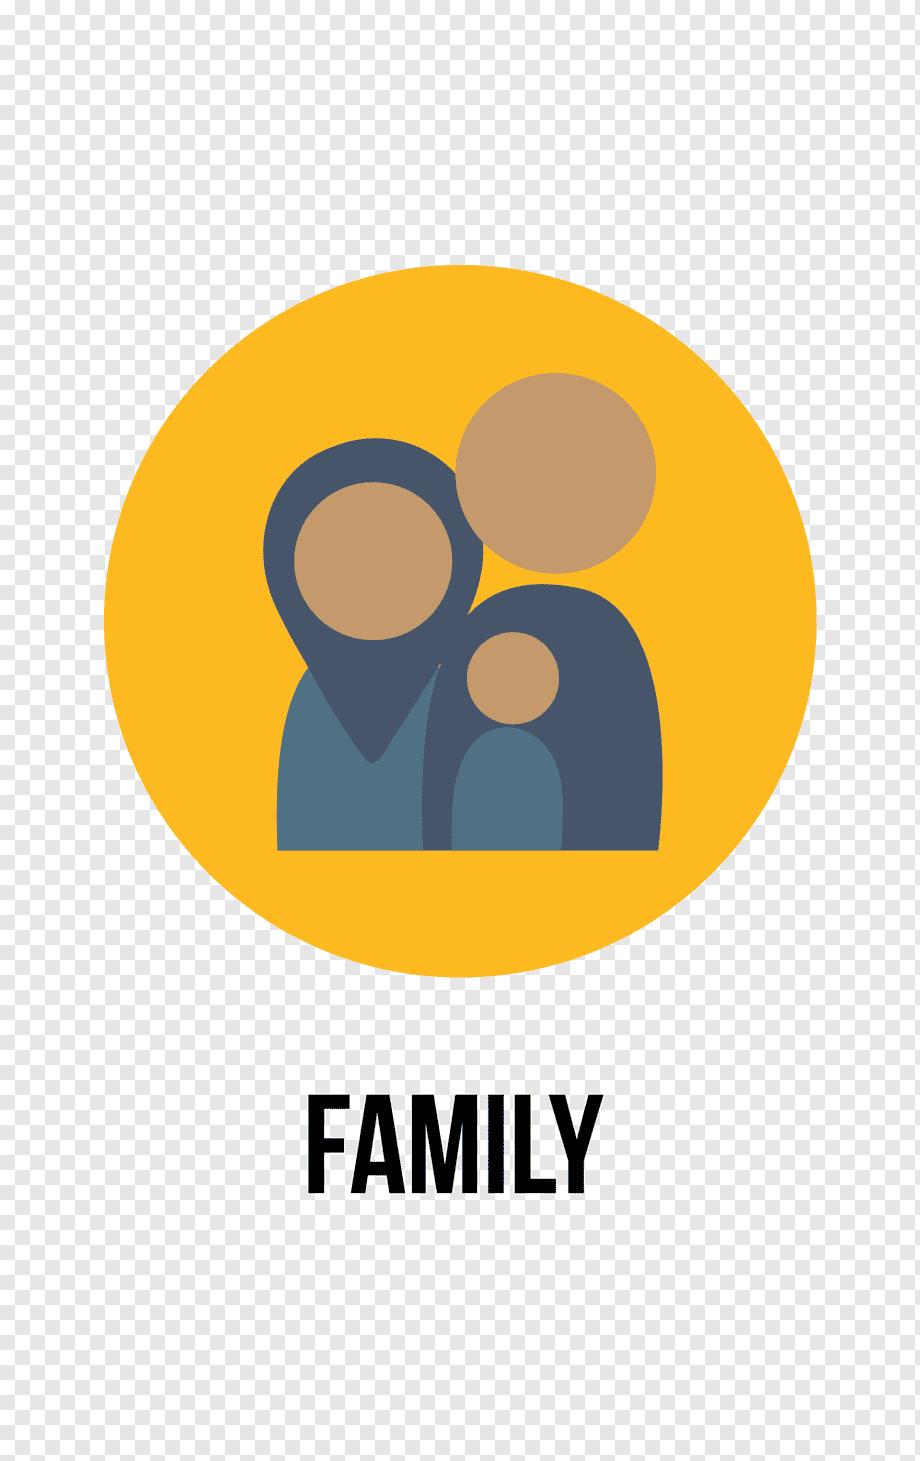 Keluarga Muslim Png : keluarga, muslim, Family, Psychology, Medieval, Islam, Muslim,, Beard,, Text,, Orange,, People, PNGWing